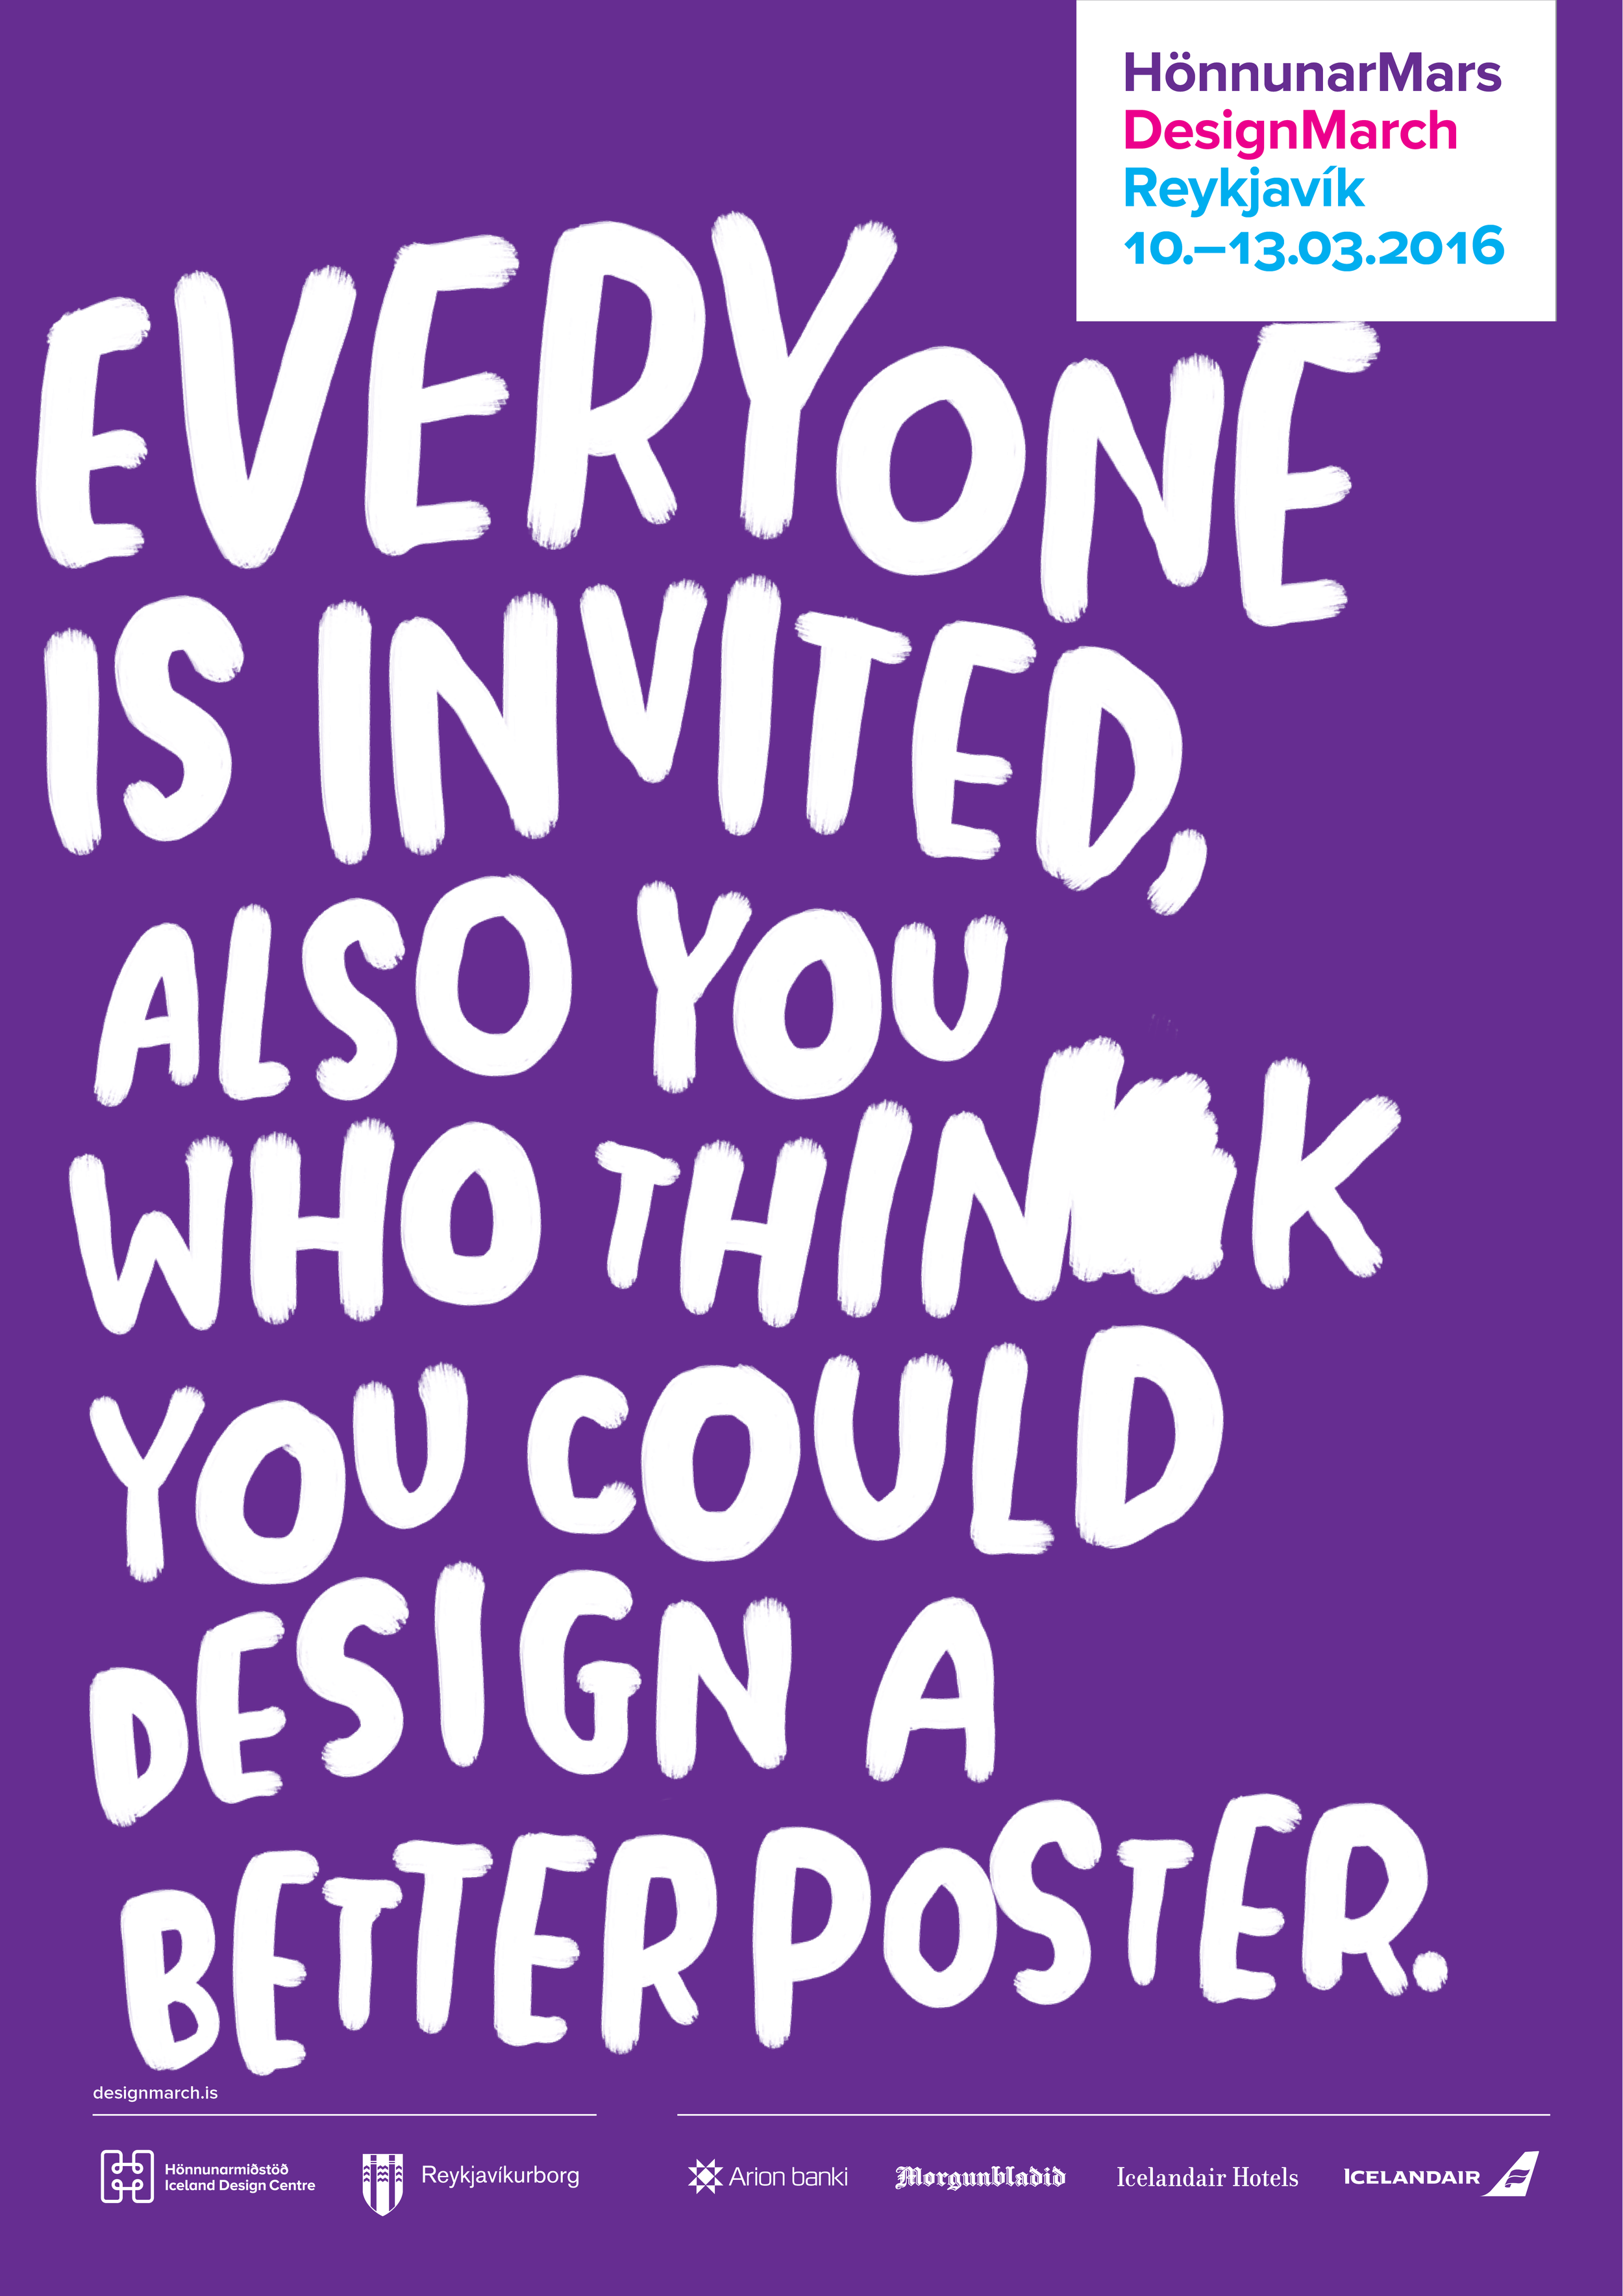 Design+a+March+brand+identity+|+tomasdottir.+|+logo+design,+pattern+design,+online+marketing,+festival+design,+branding,+illustration,+modern,+poster+design